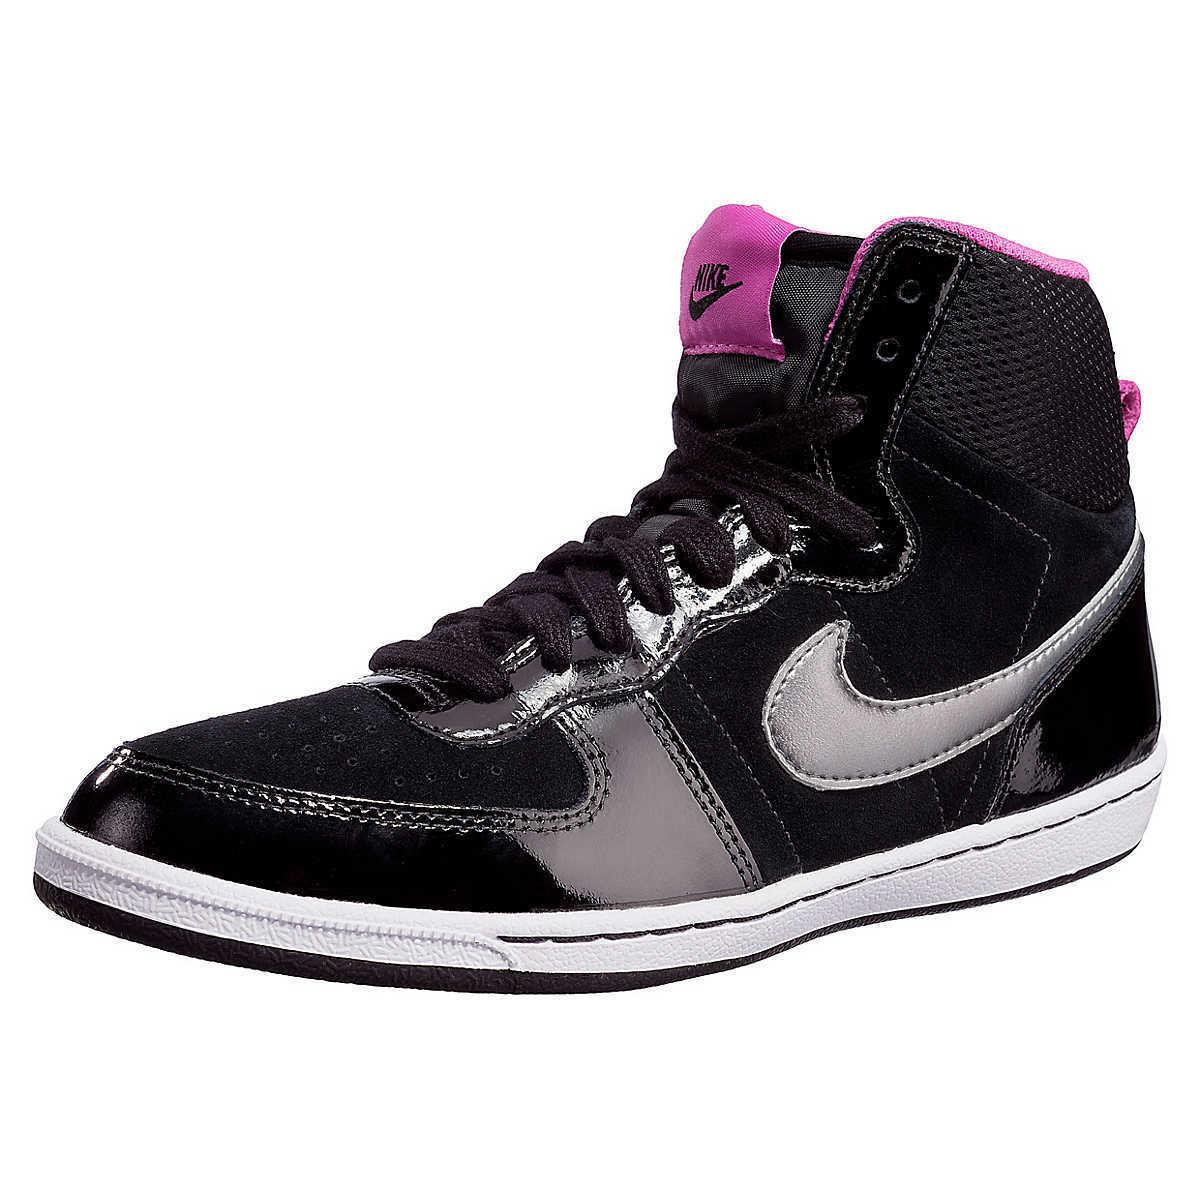 Nike Terminator hi-top, Lite señora Sportswear Hi sneakers hi-top, Terminator negro, 2071a0